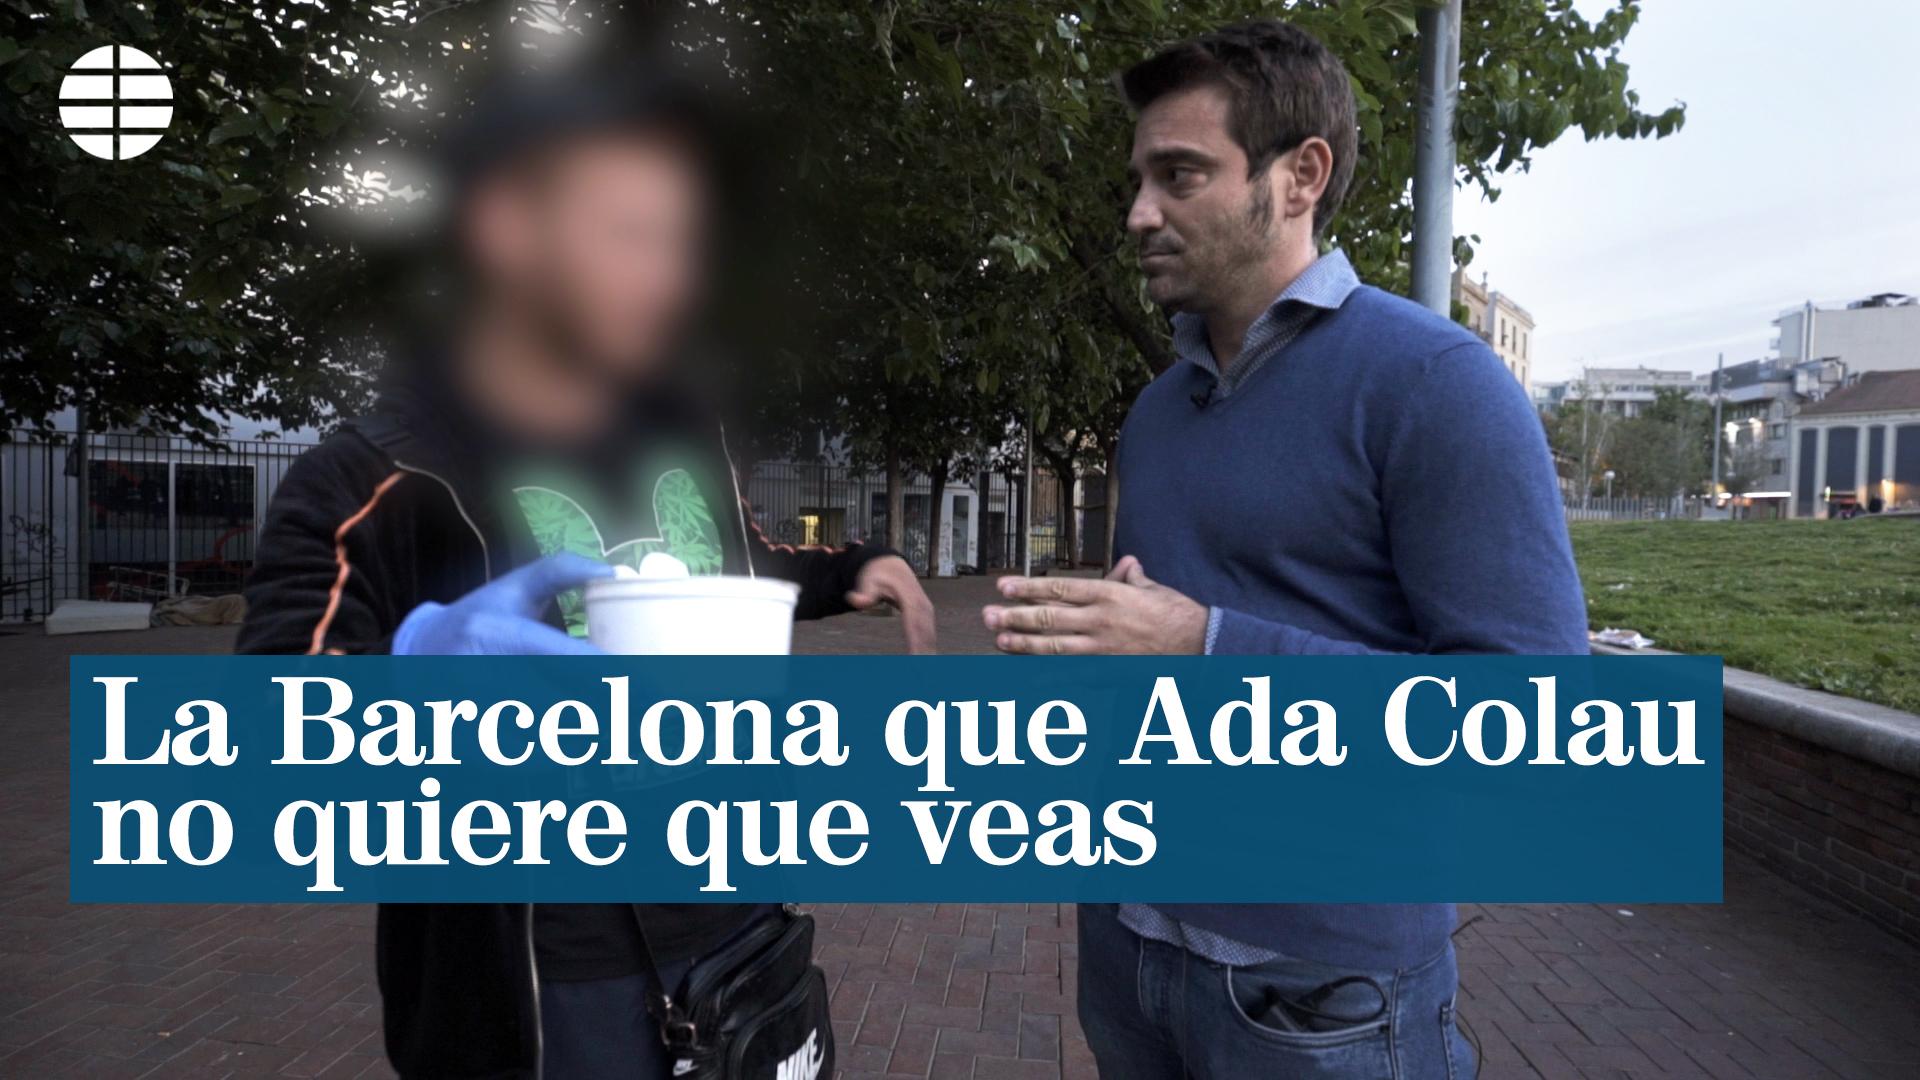 La Barcelona de Colau